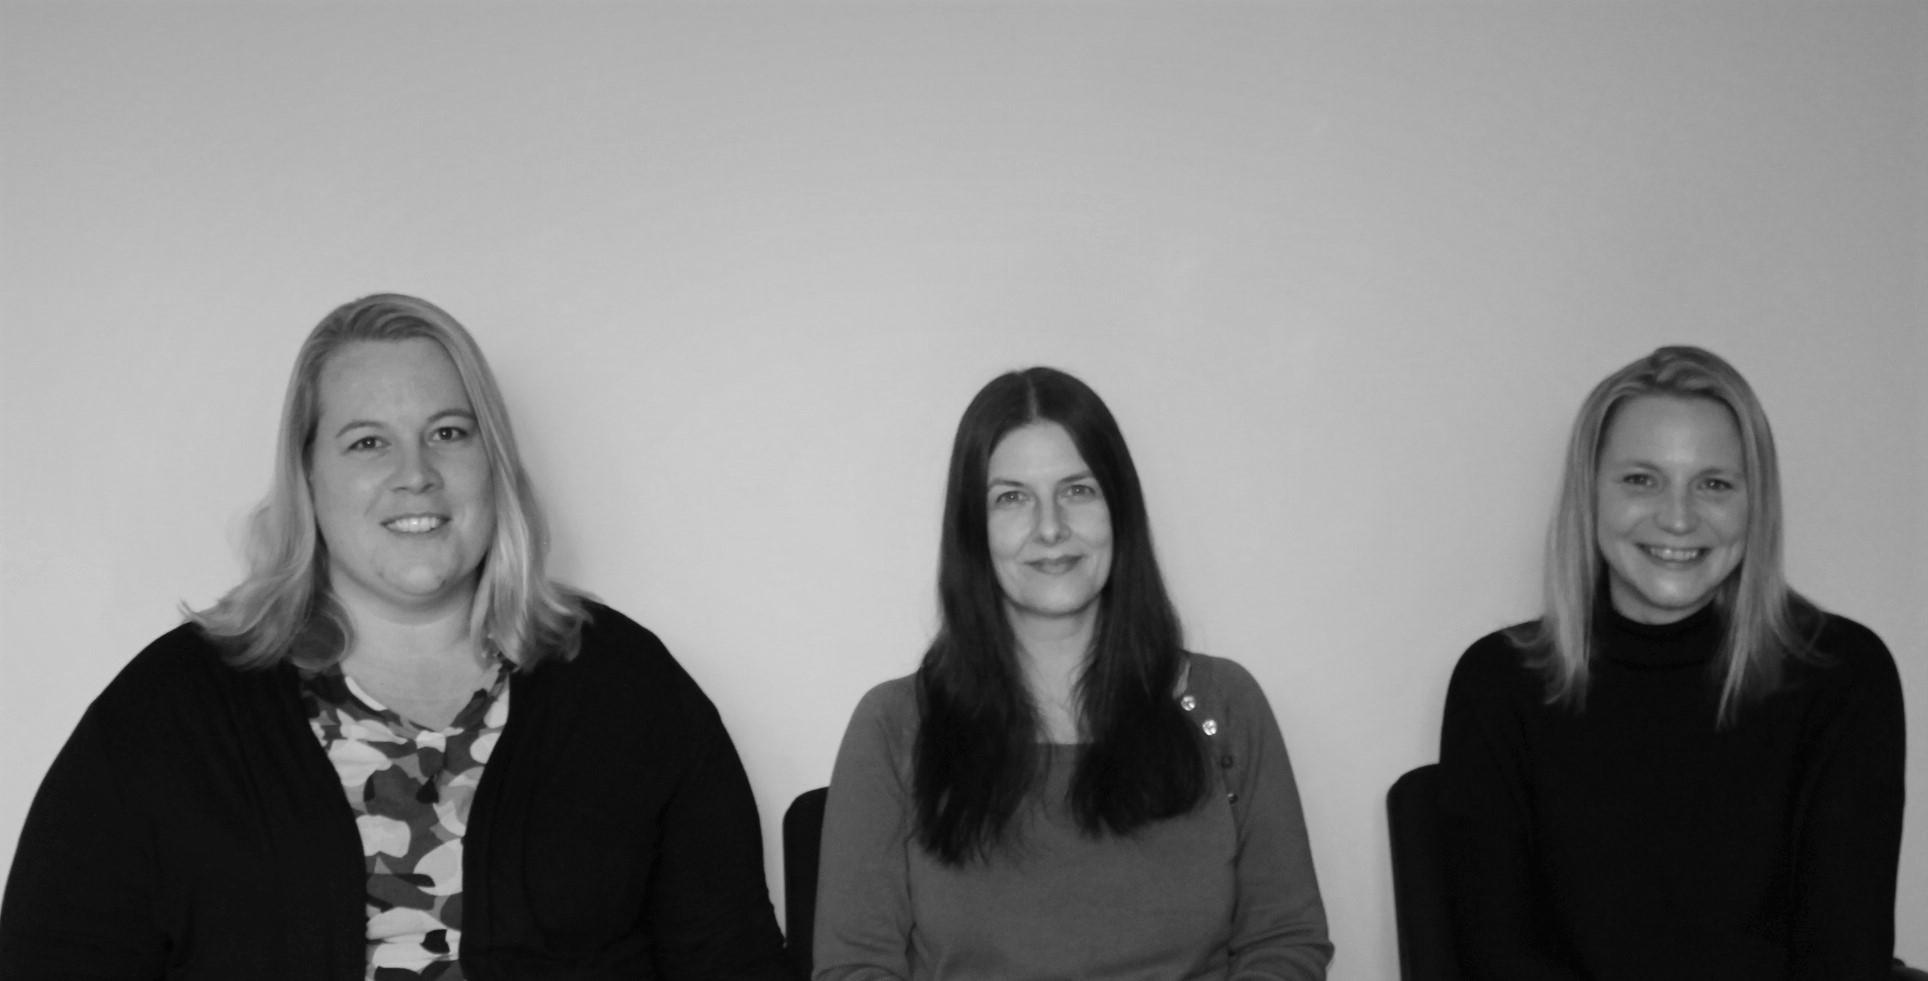 Silke Gerritzen, Daniela Floß, Melanie Krämer